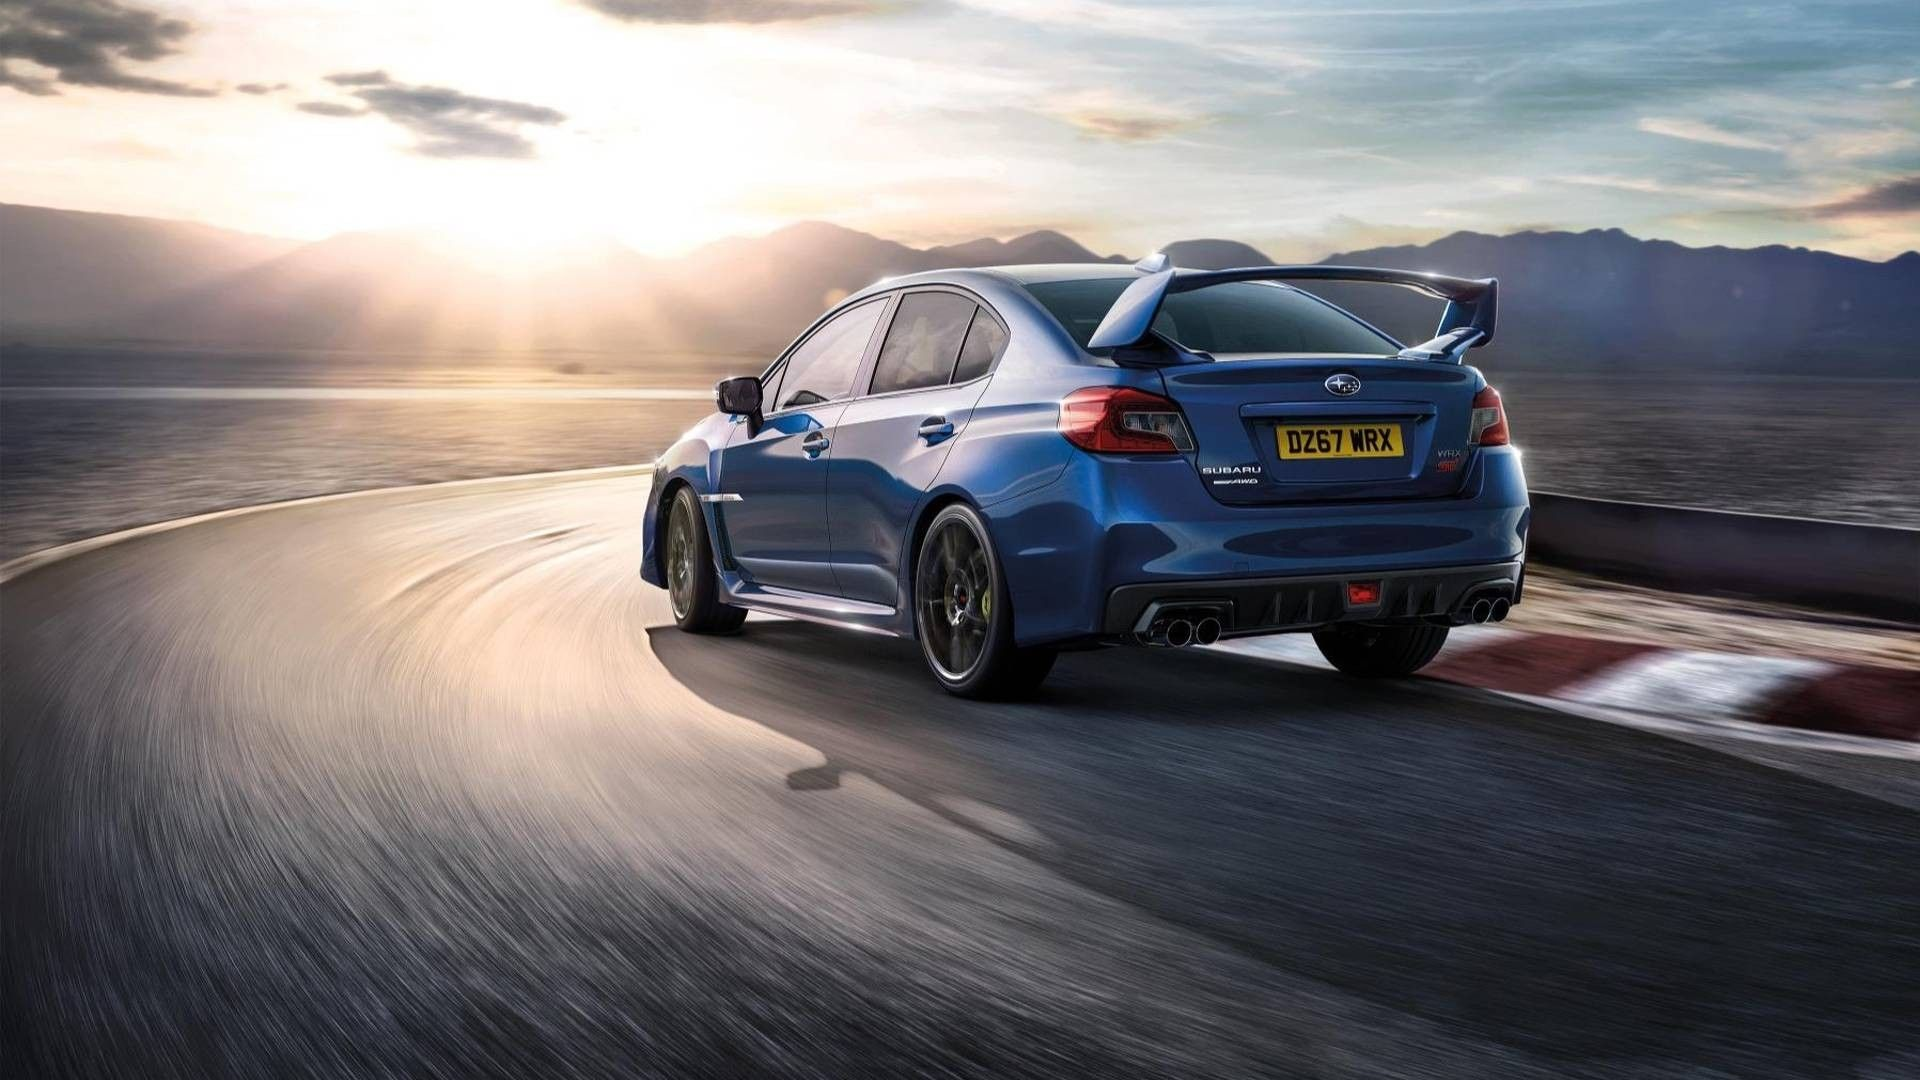 2019 Subaru Wrx Sti Horsepower Price And Release Date Car Gallery Subaru Wrx Subaru Wrx Sti Subaru